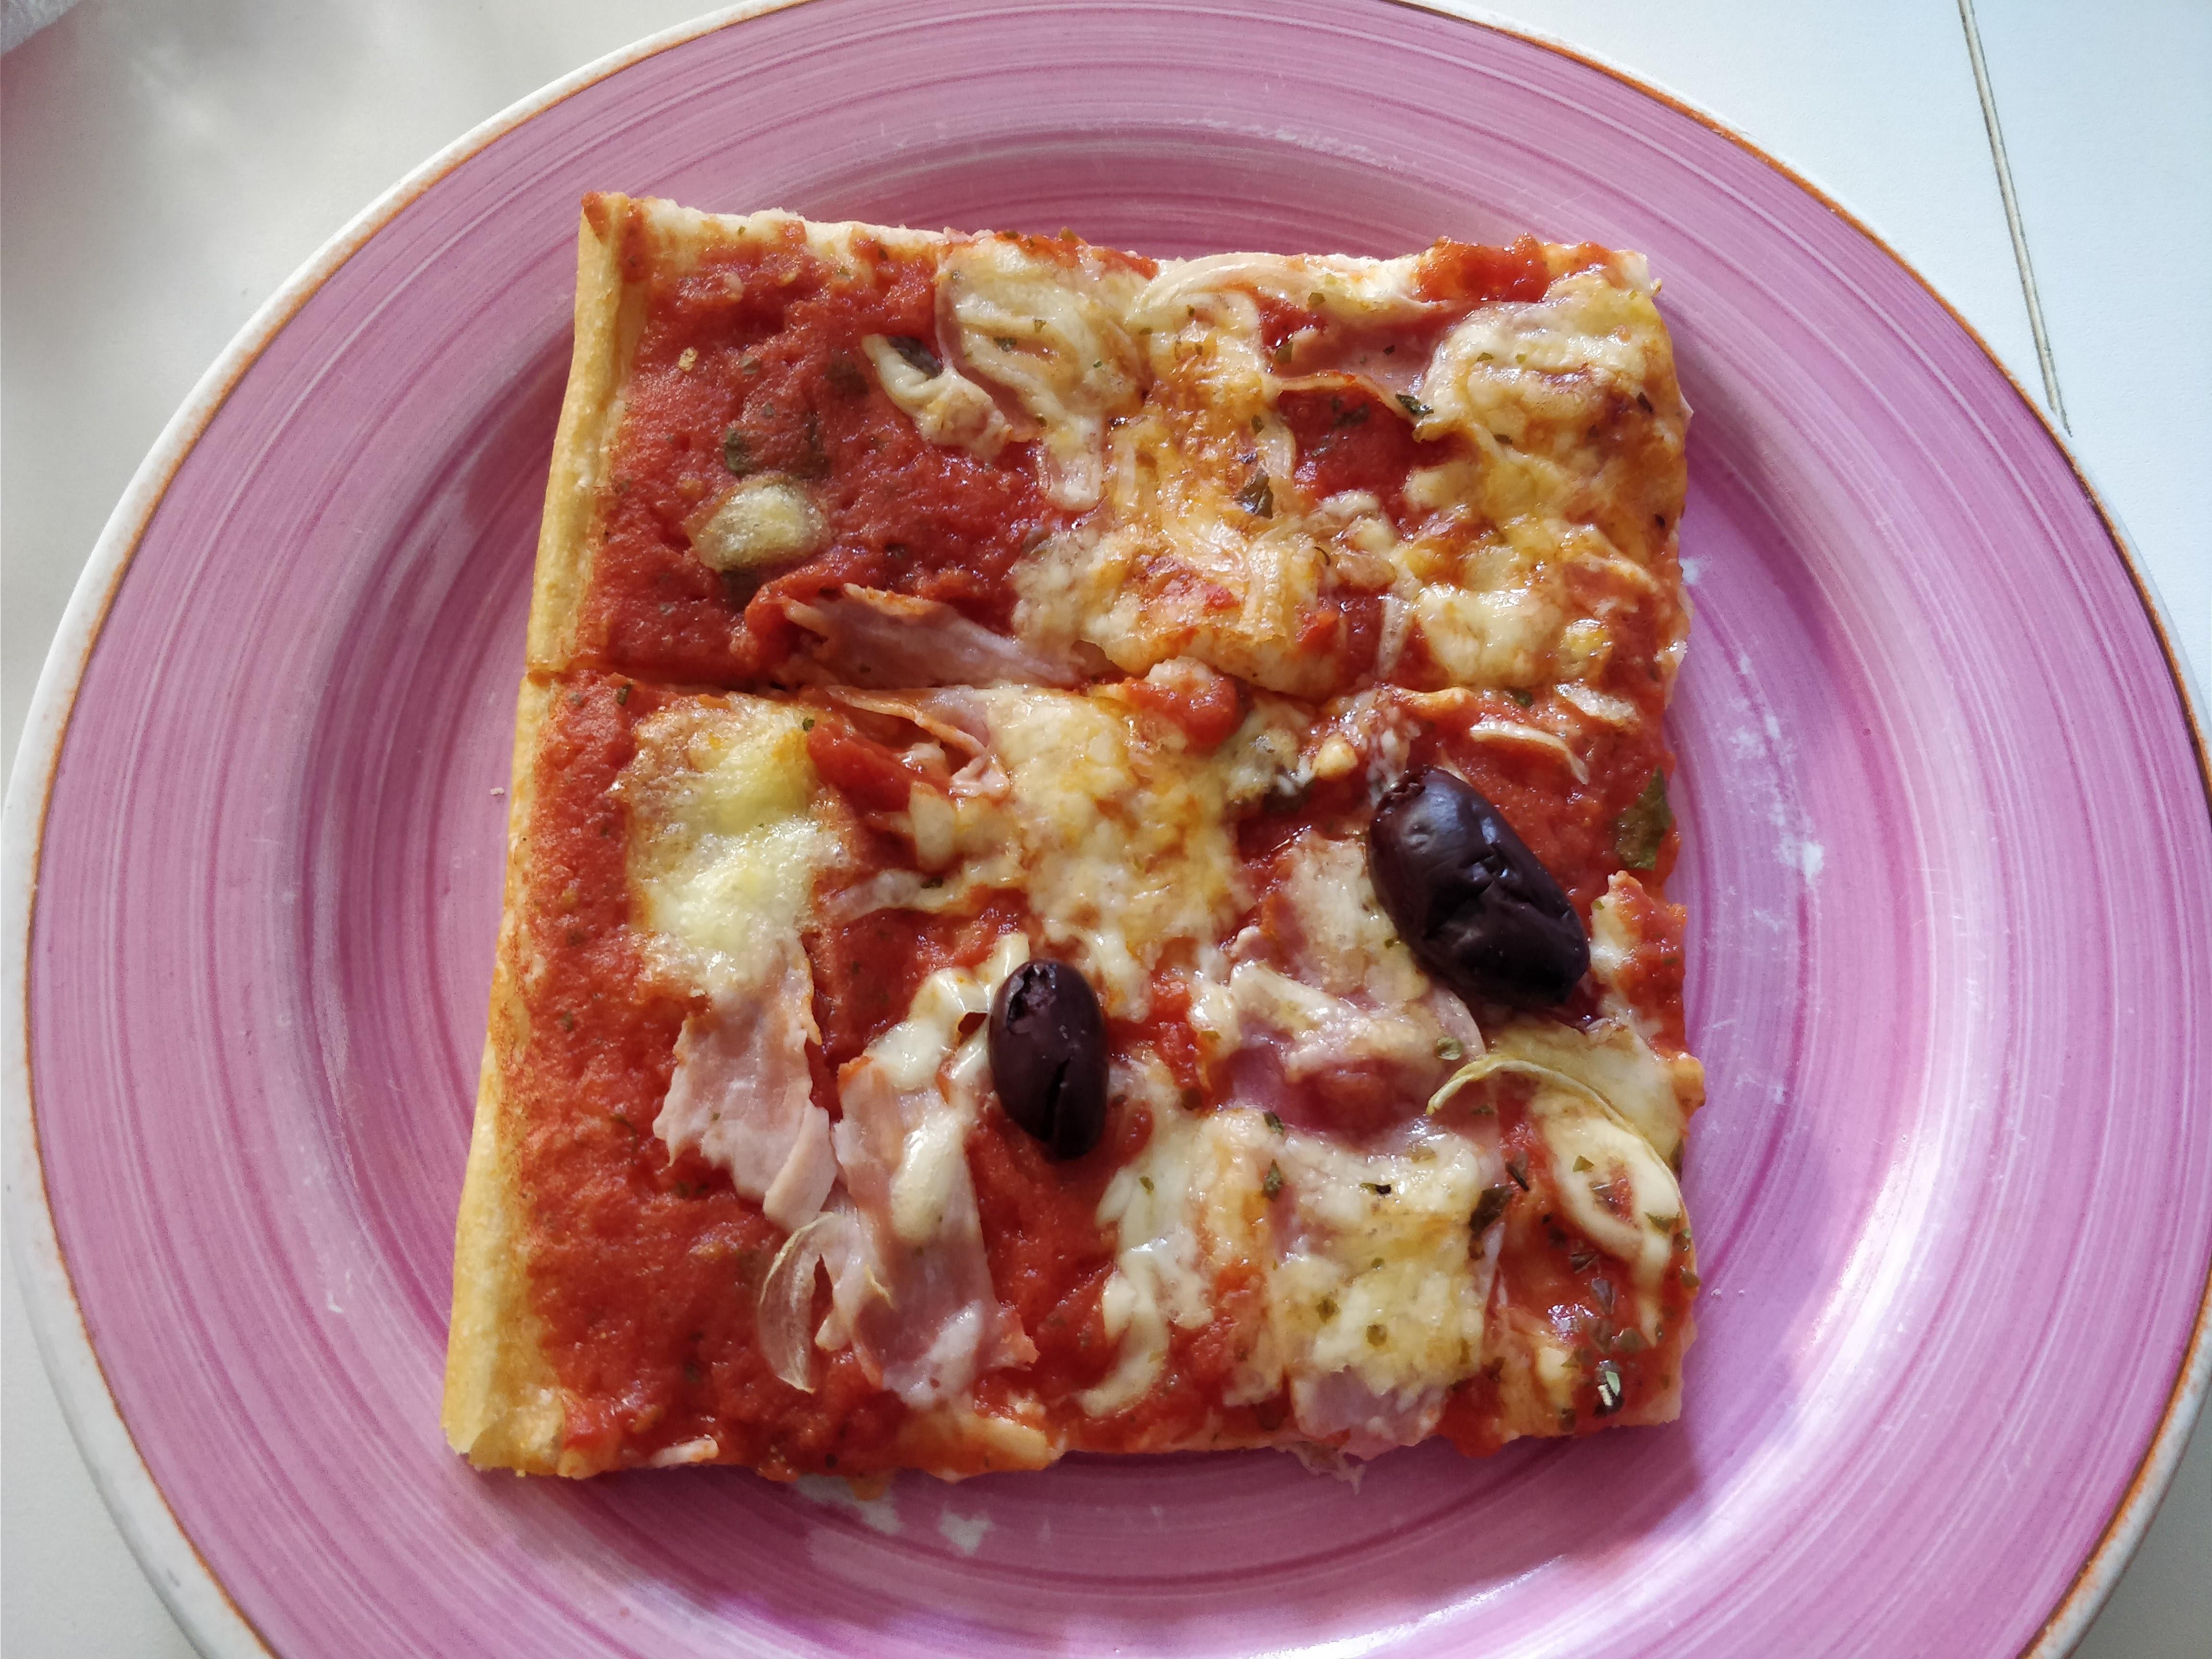 http://foodloader.net/nico_2018-03-31_selbstgemachte-pizza.jpg